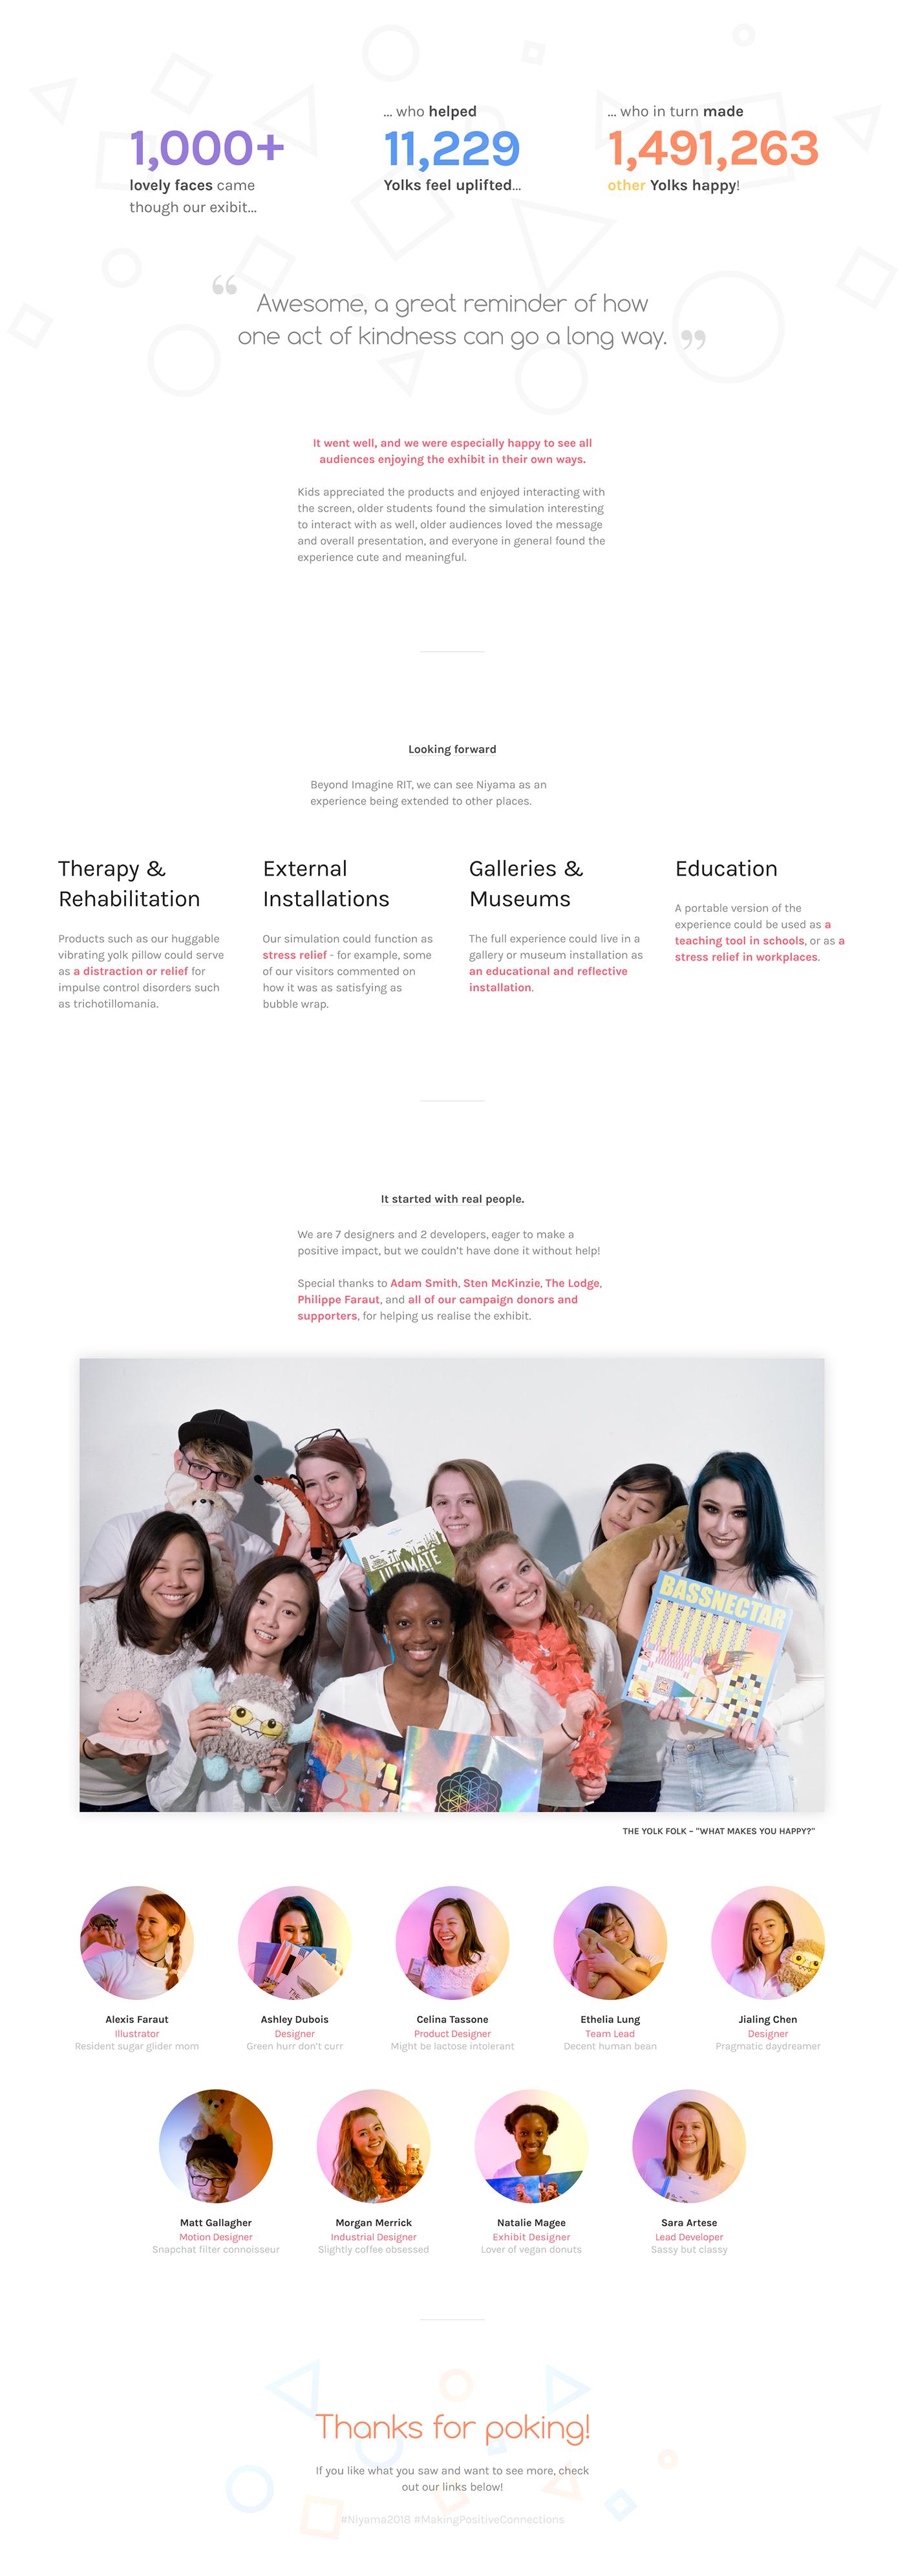 Capstone new media team project positivity social impact adobeawards do good